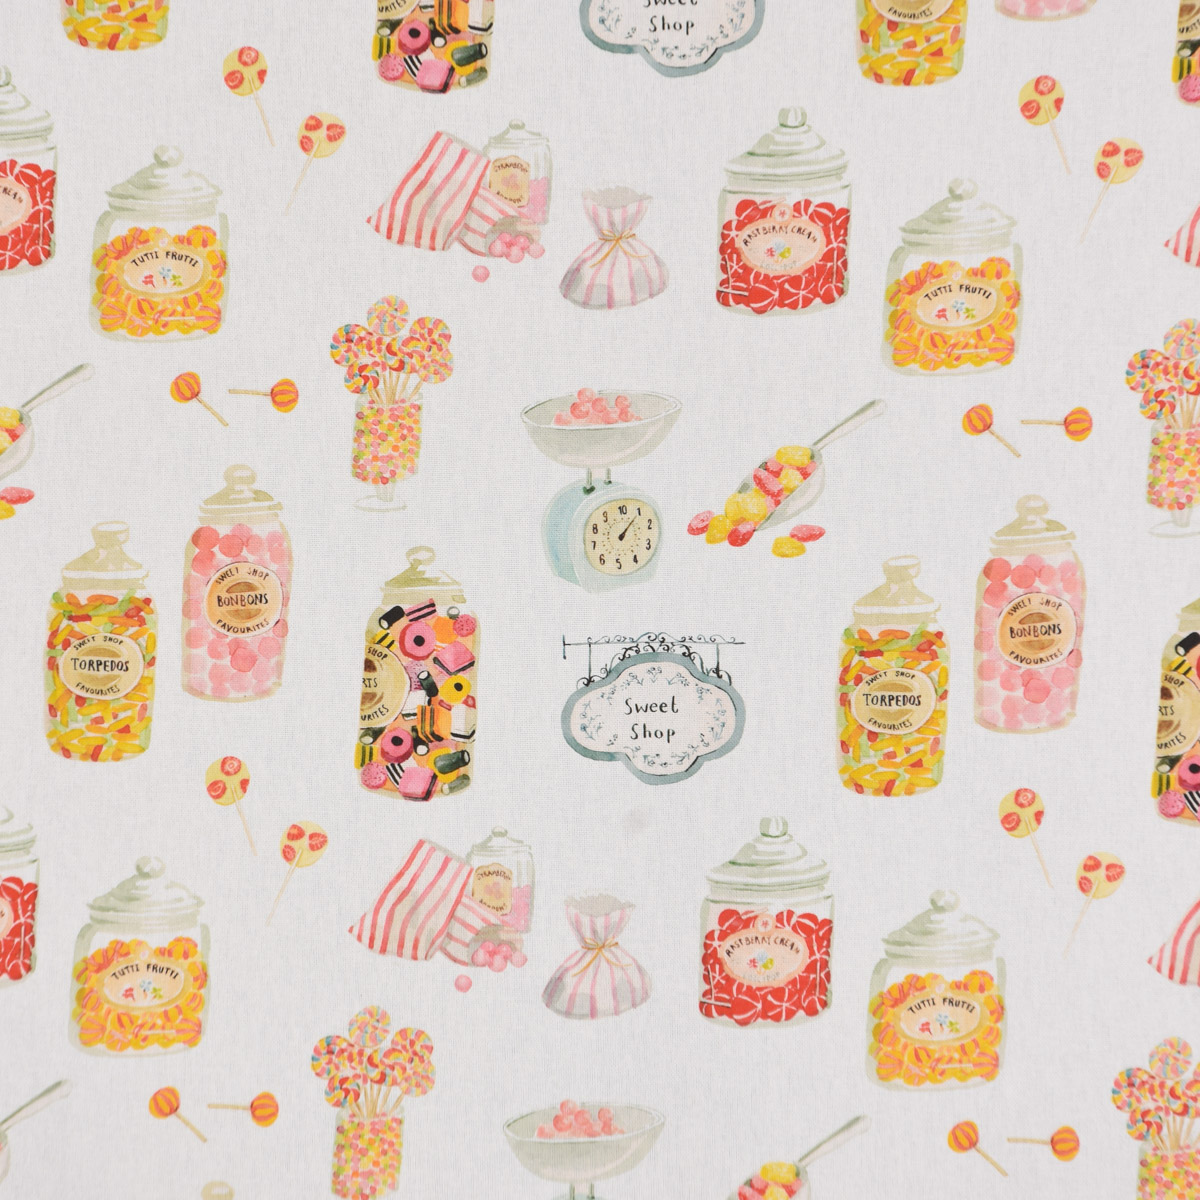 Clarke & Clarke STUDIO G Digitaldruck Süßigkeiten Bonbons Candyshop ecru multi 138cm Breite